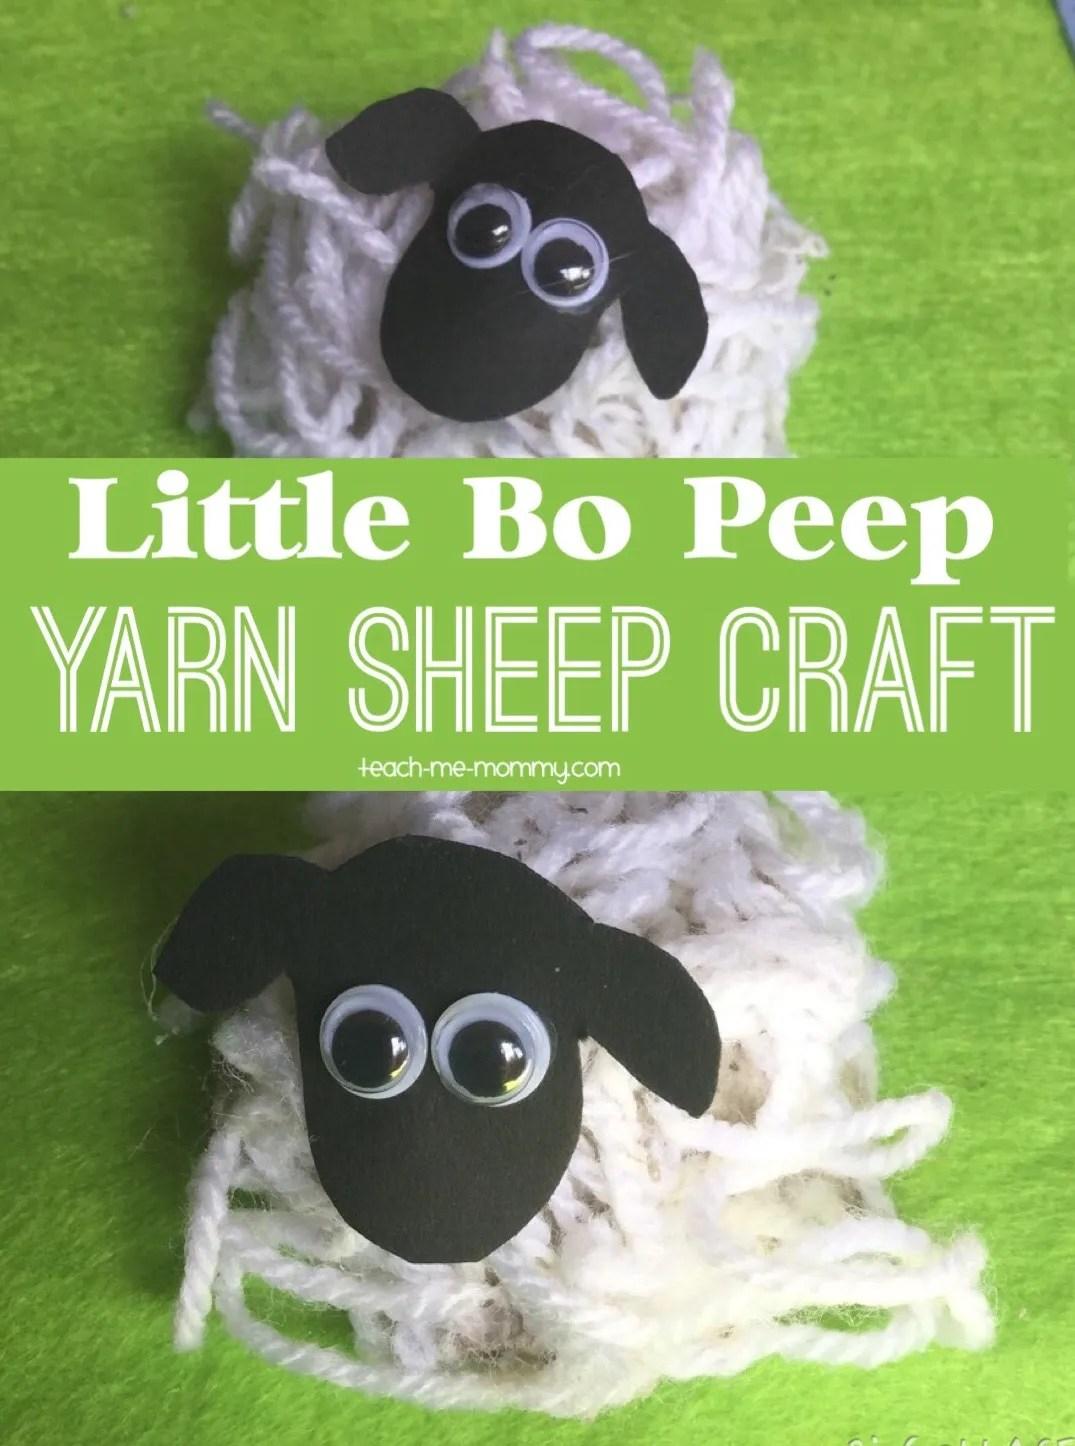 Little Bo Peep Sheep Craft